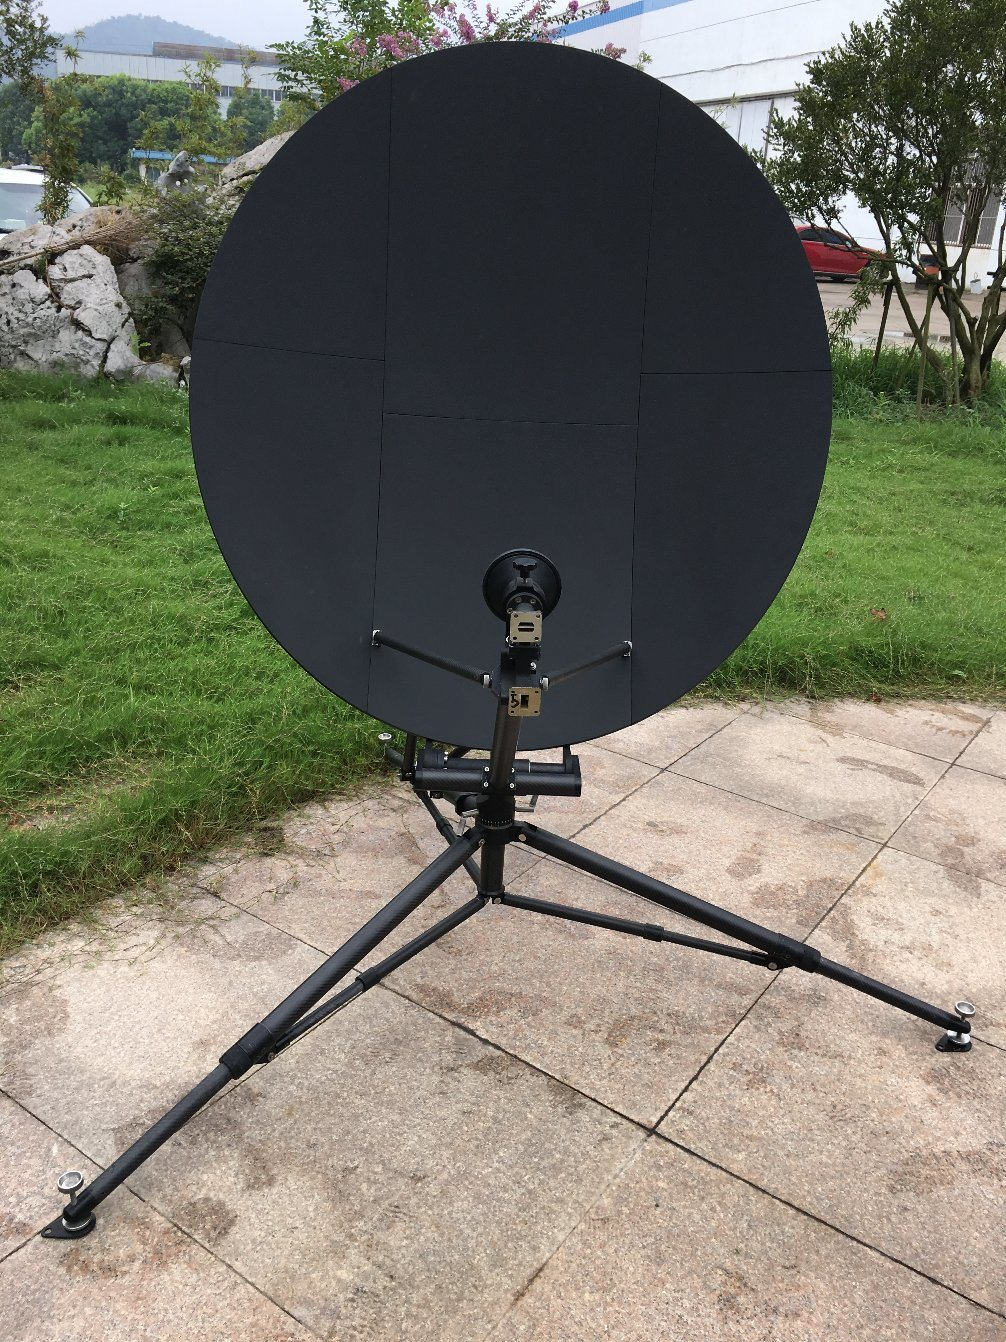 1.2m Full Carbon Fiber Rxtx Flyaway Satellite Antenna